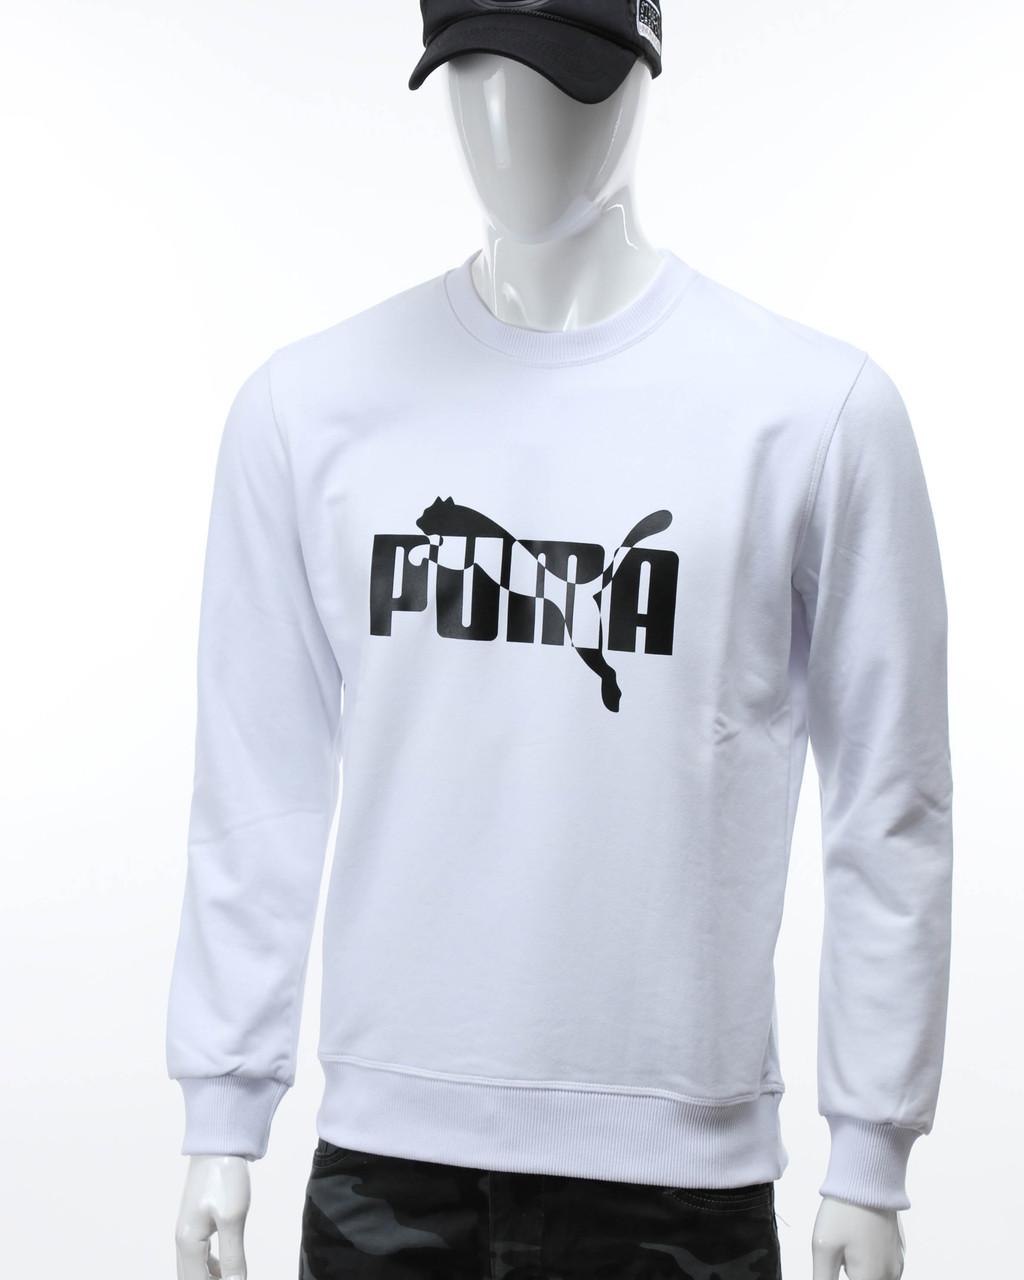 Свитшот мужской белый PUMA с лого №2 WHT XXL(Р) 20-414-001